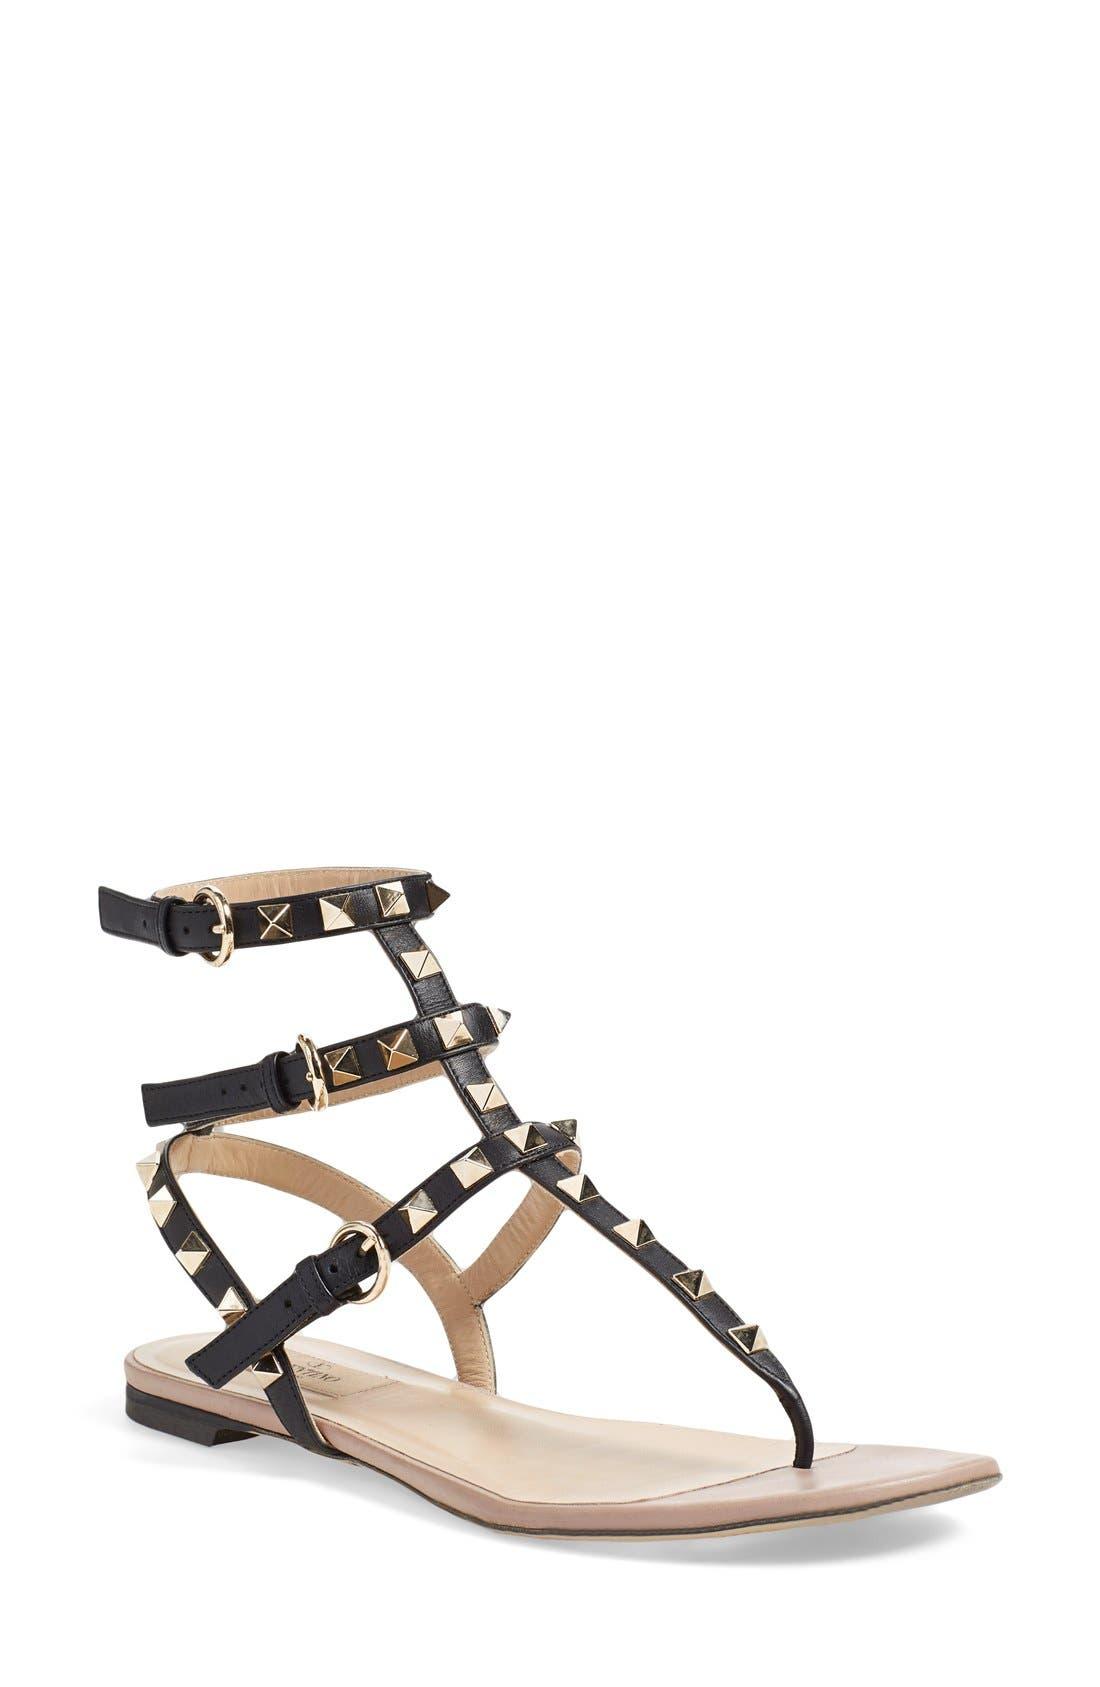 Main Image - VALENTINO GARAVANI 'Rockstud' Sandal (Women)